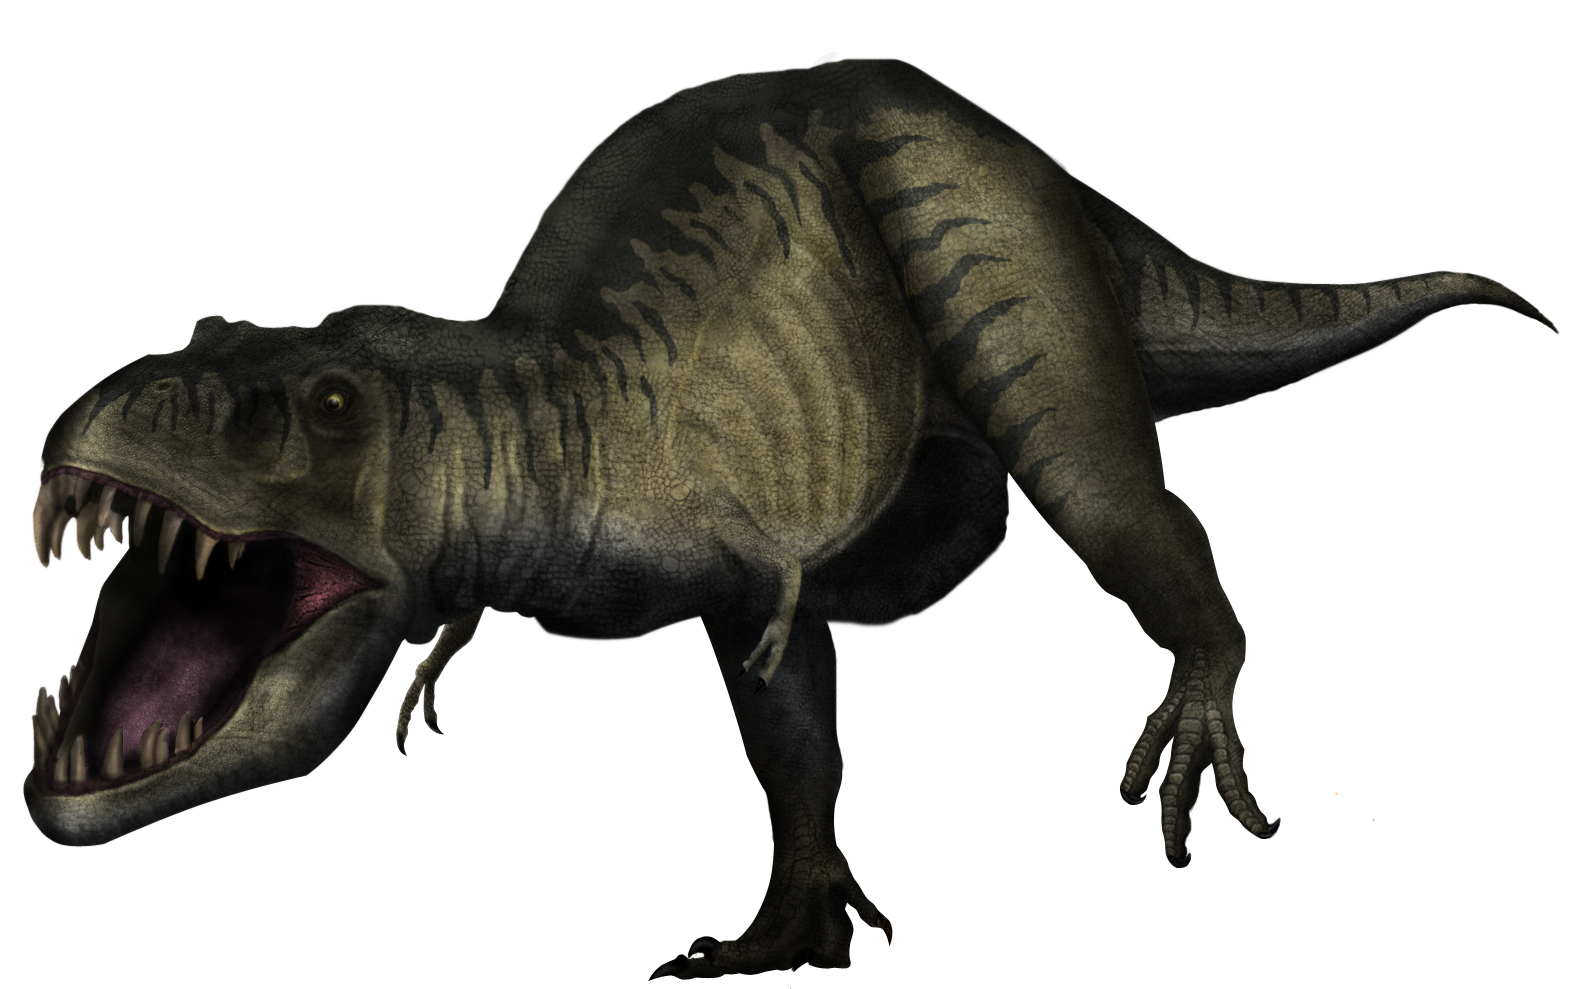 Tyrannosaurus Rex Paintings Uk